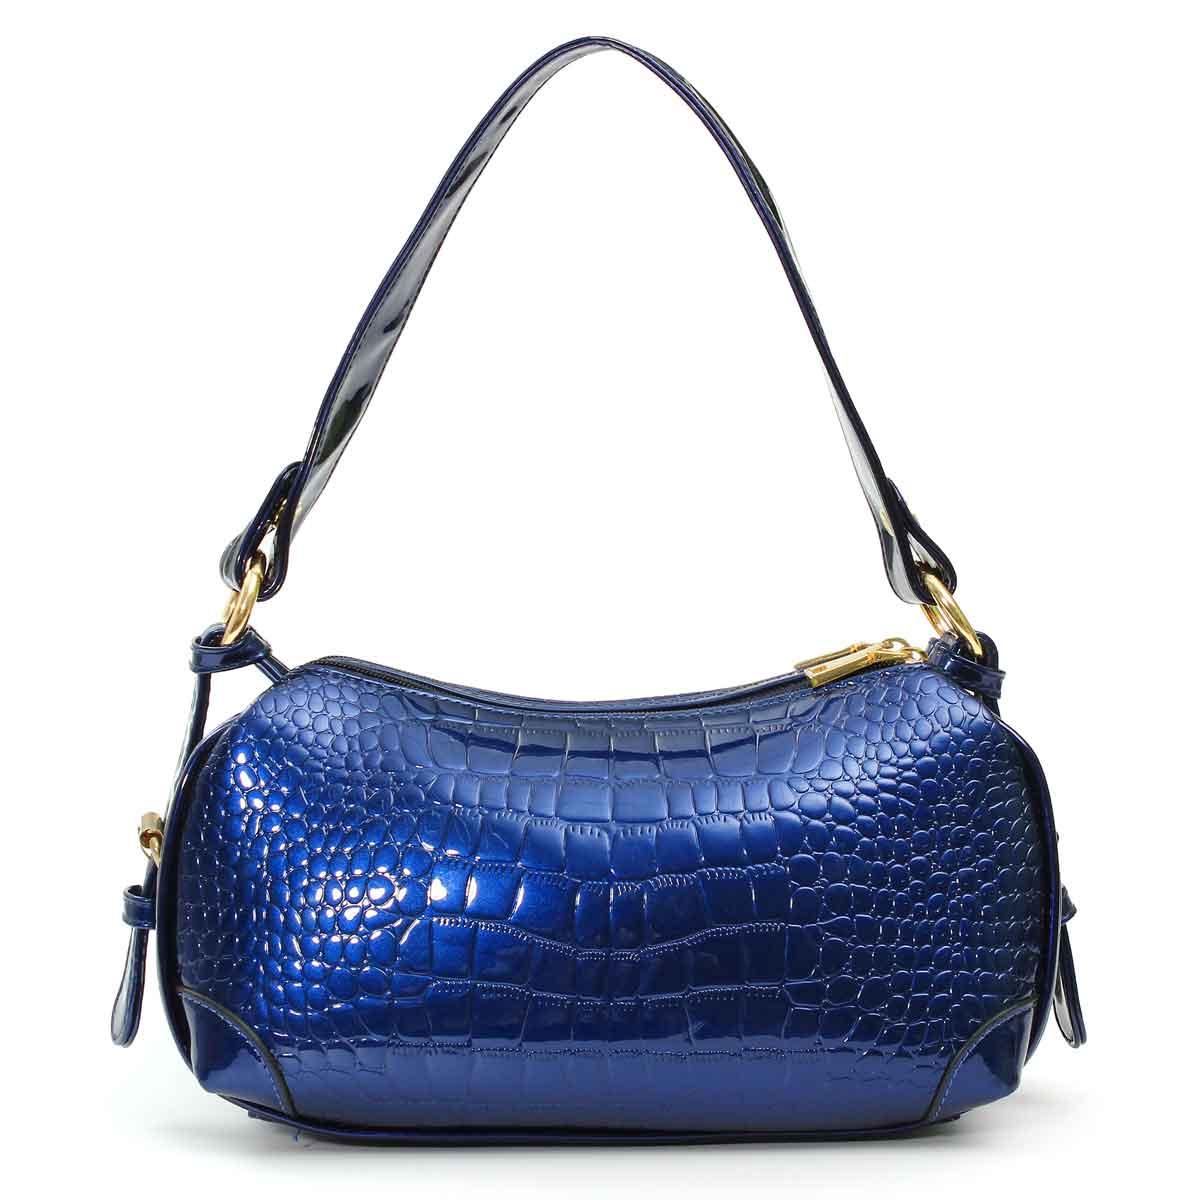 Luxury Alligator Baguette Bag For Women 2020 Retro PU Leather Women Shoulder Bag Mini Crocodile Bags Purse Handbags Bolsas